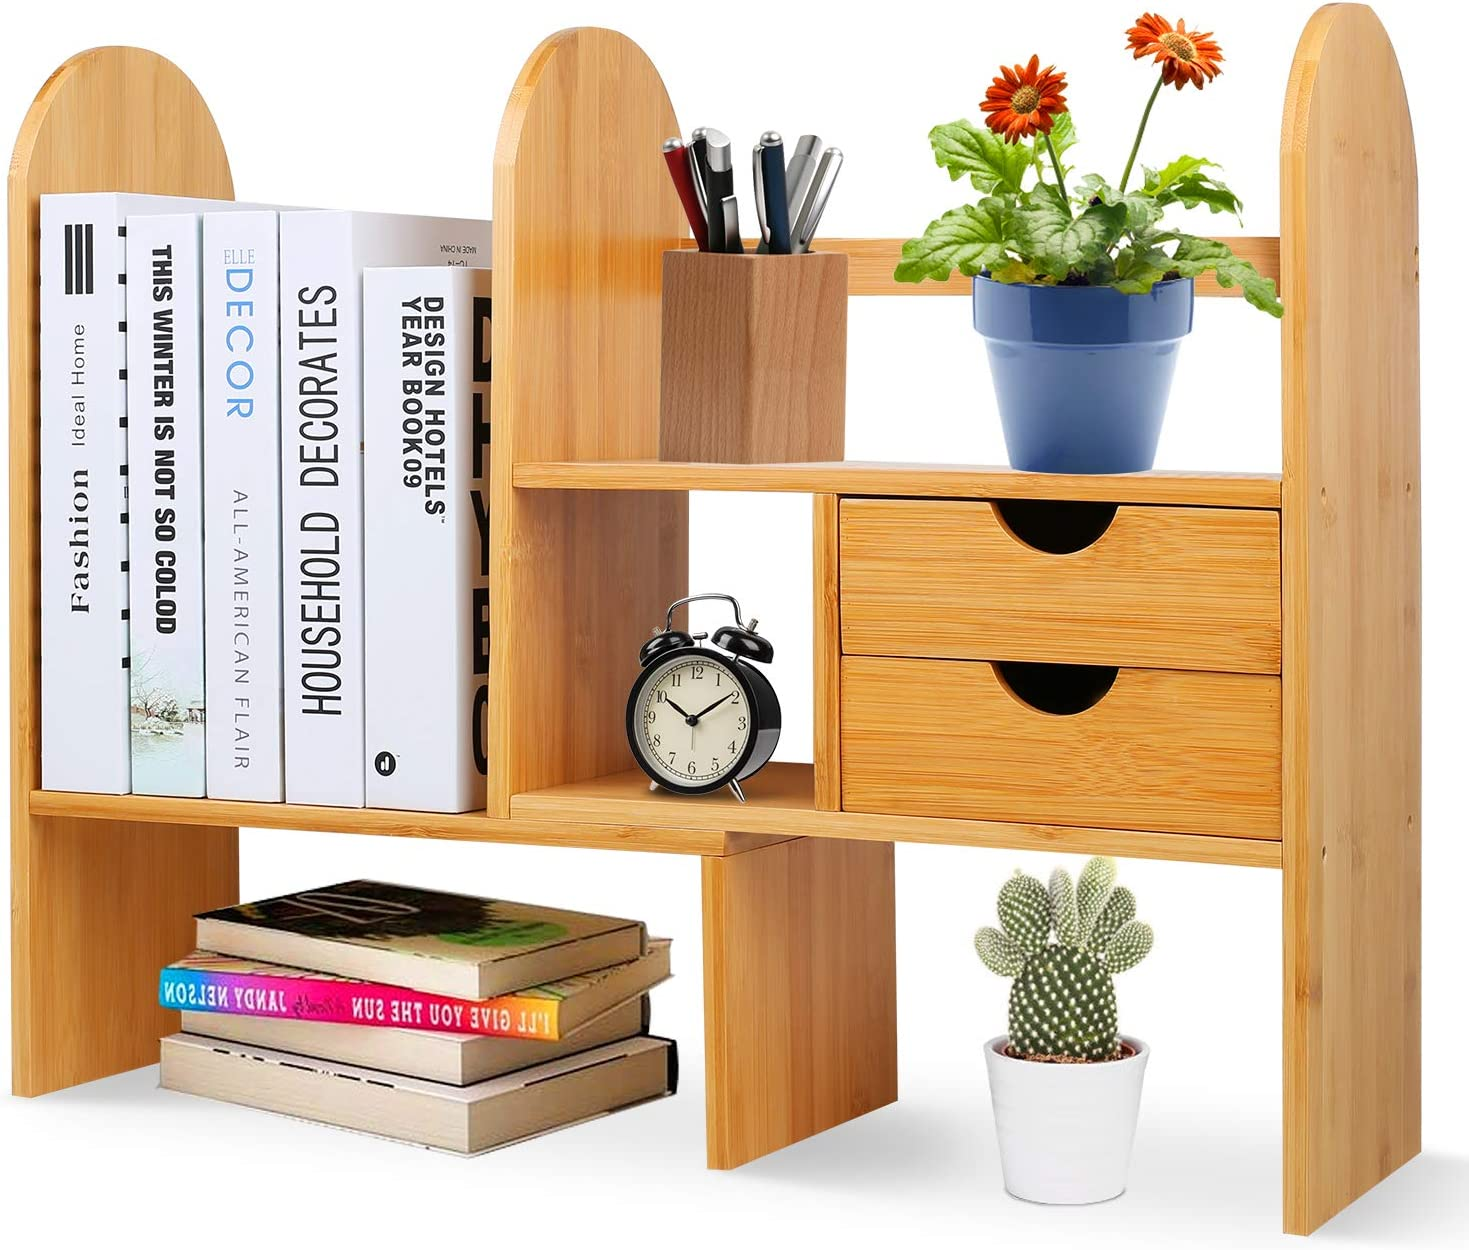 Desktop Bookshelf with 2 Drawers, Adjustable Wood Desk Storage Organizer Display Shelf Rack for Office Supplies, Kitchen,Bathroom, Makeup